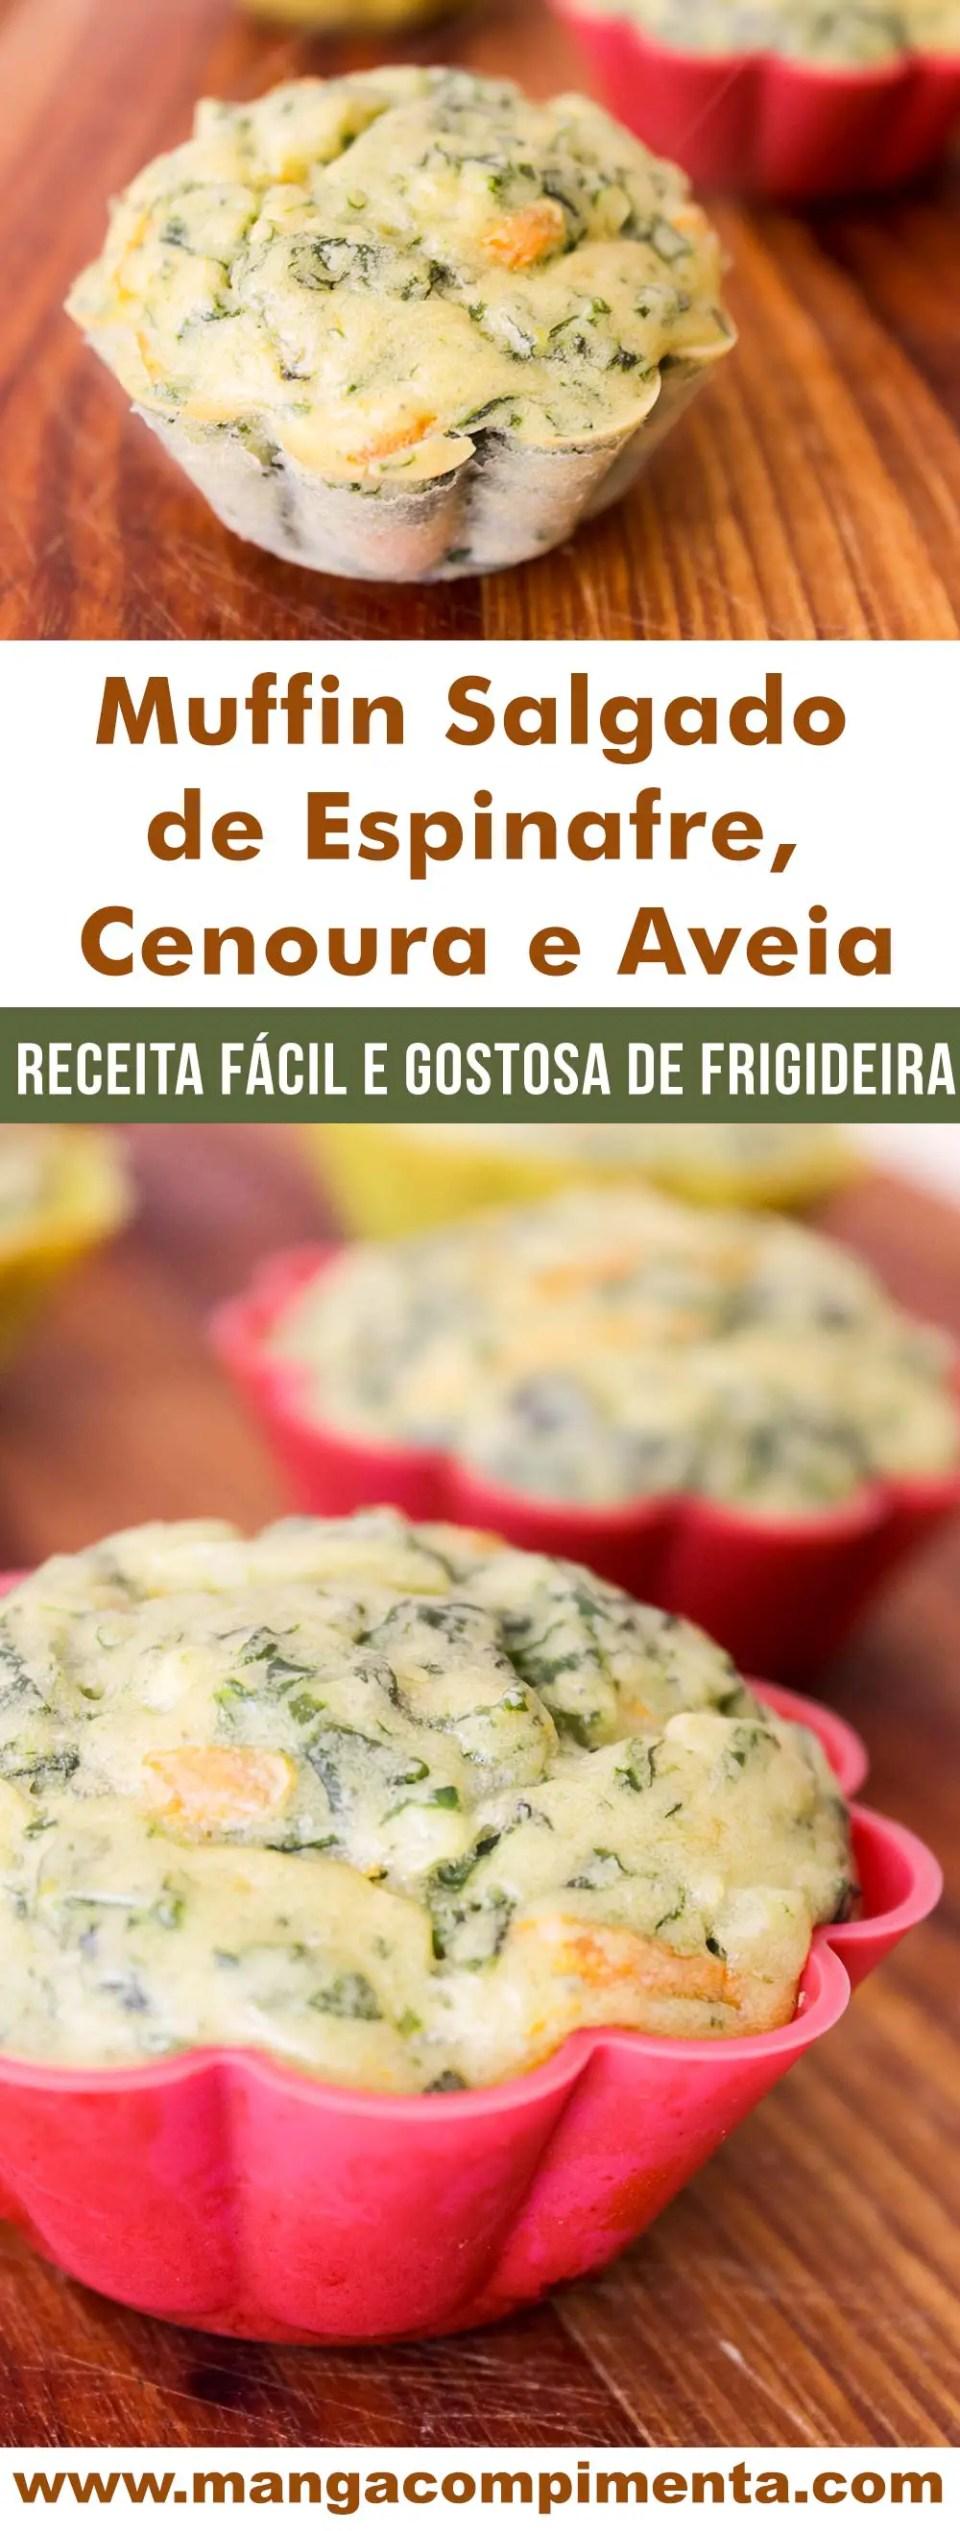 Muffin Salgado de Espinafre, Cenoura e Aveia - um petisco perfeito para o lanche da tarde!